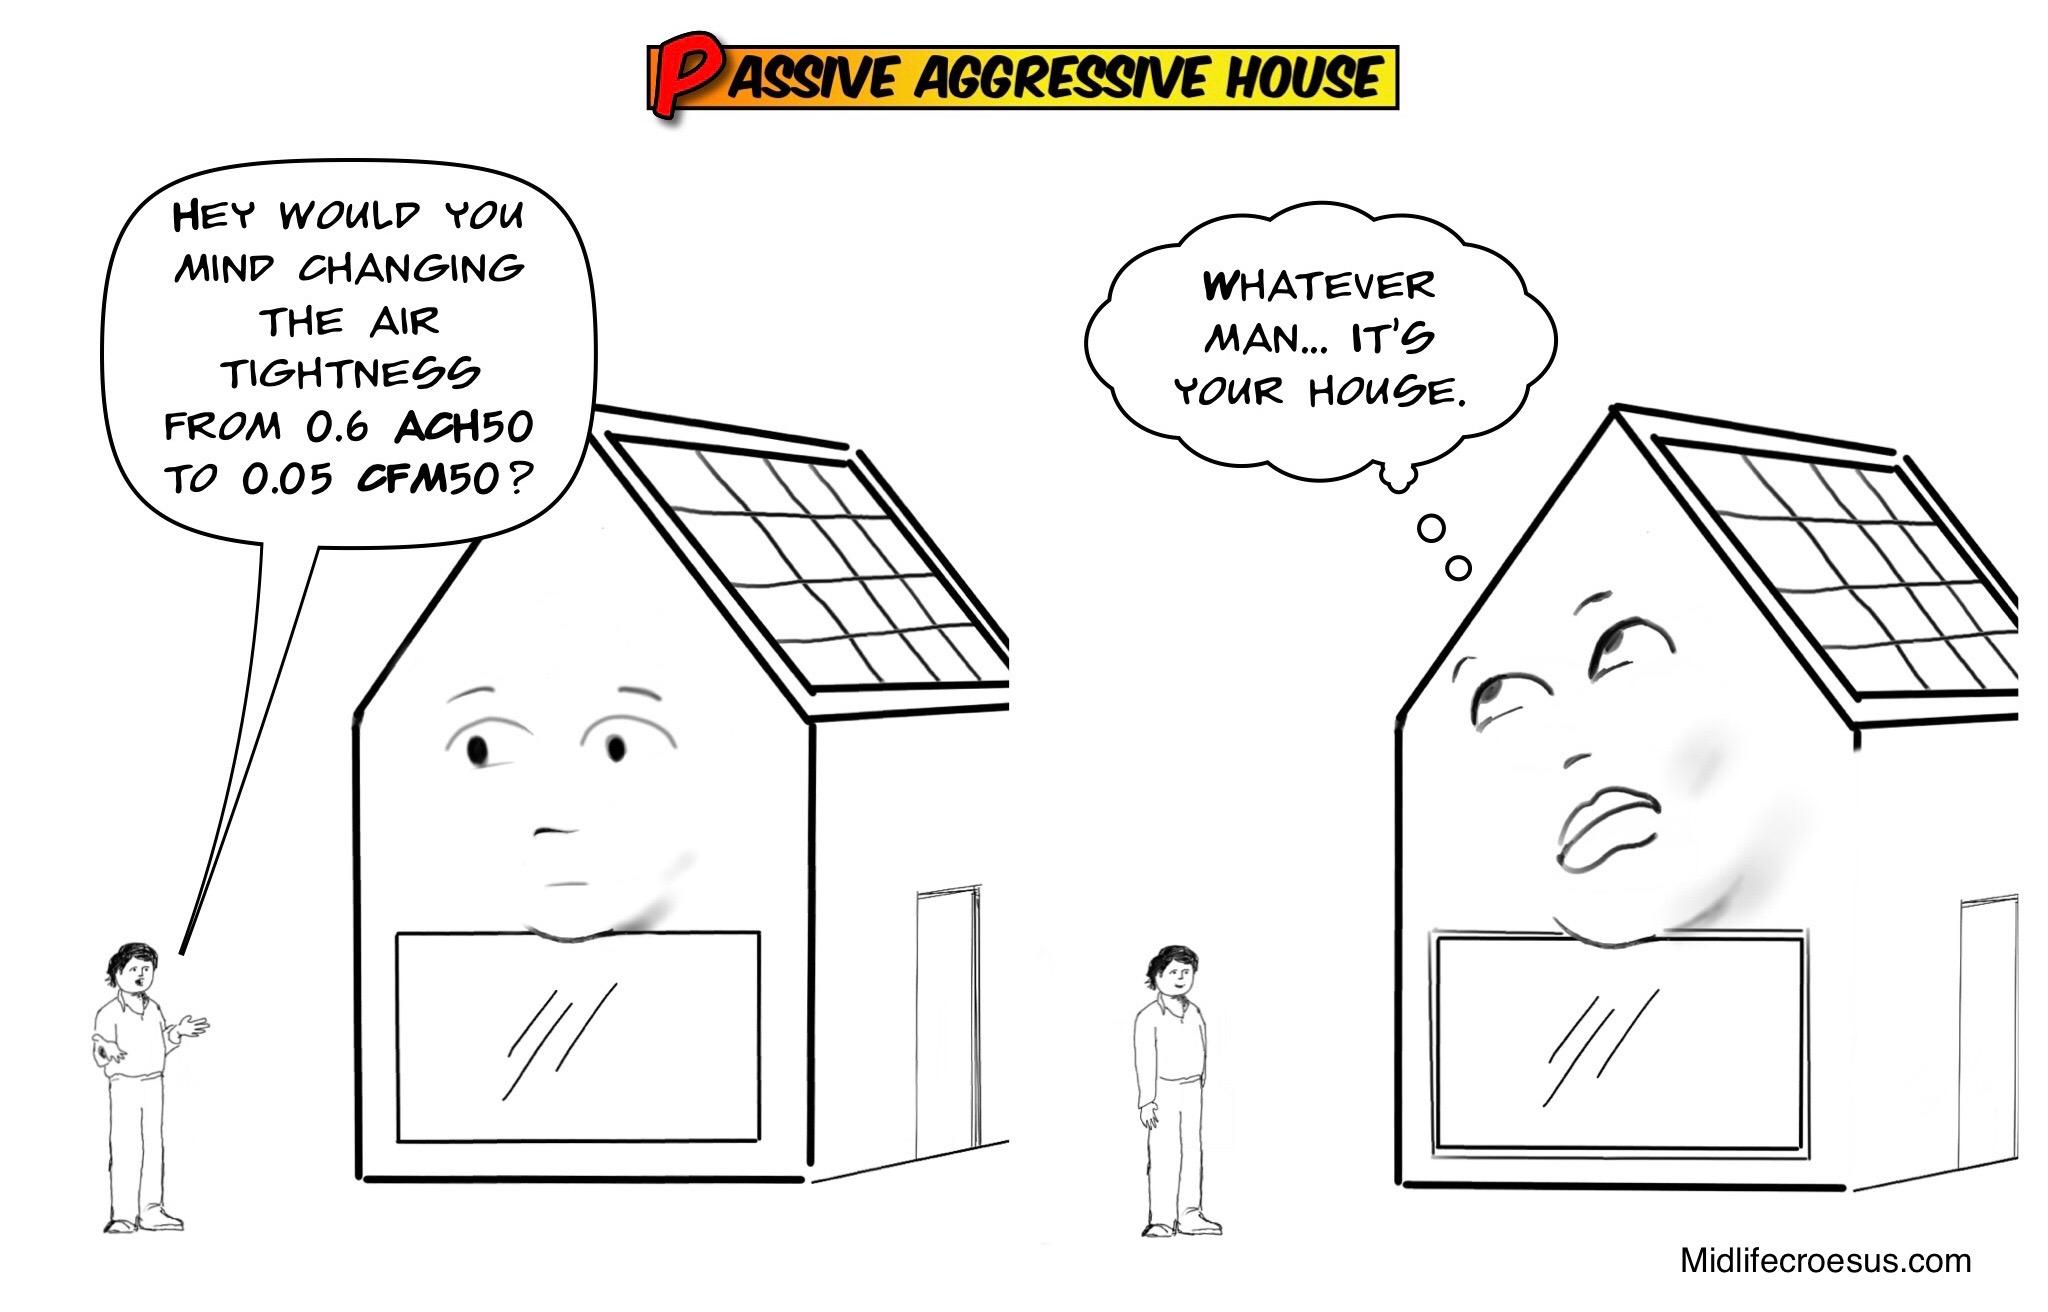 Passive Aggressive House